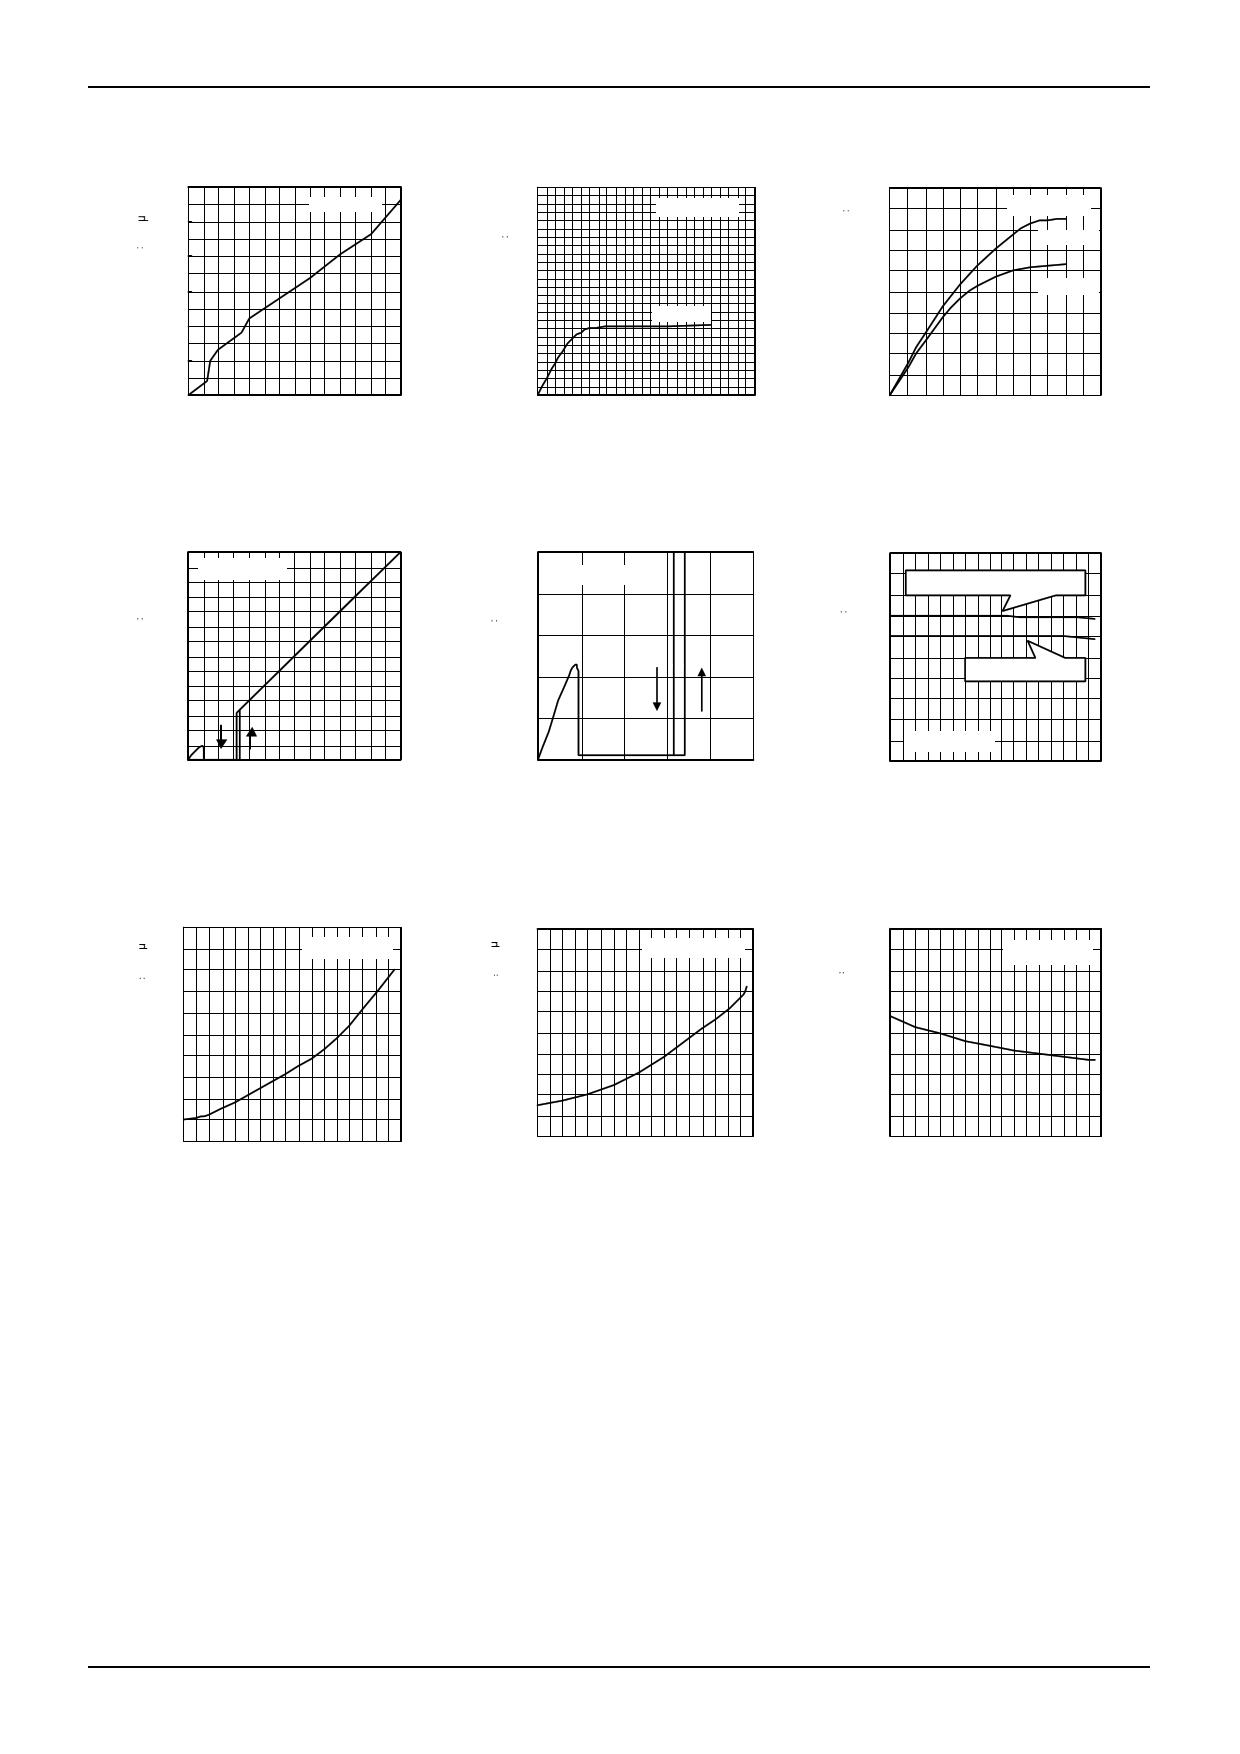 BU4945 pdf, 반도체, 판매, 대치품